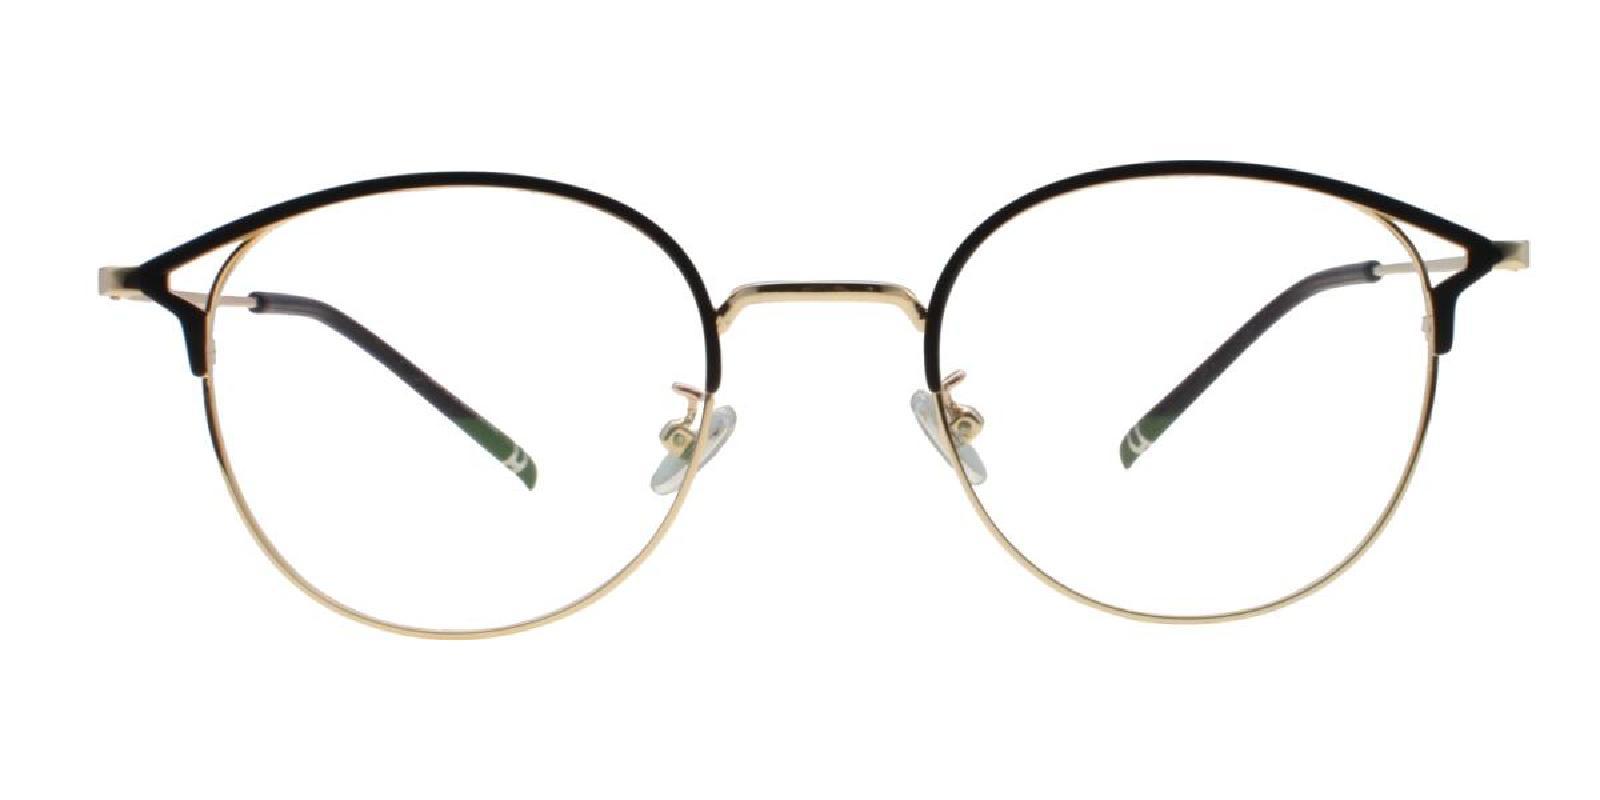 Brace-Gold-Browline-Metal-Eyeglasses-additional2